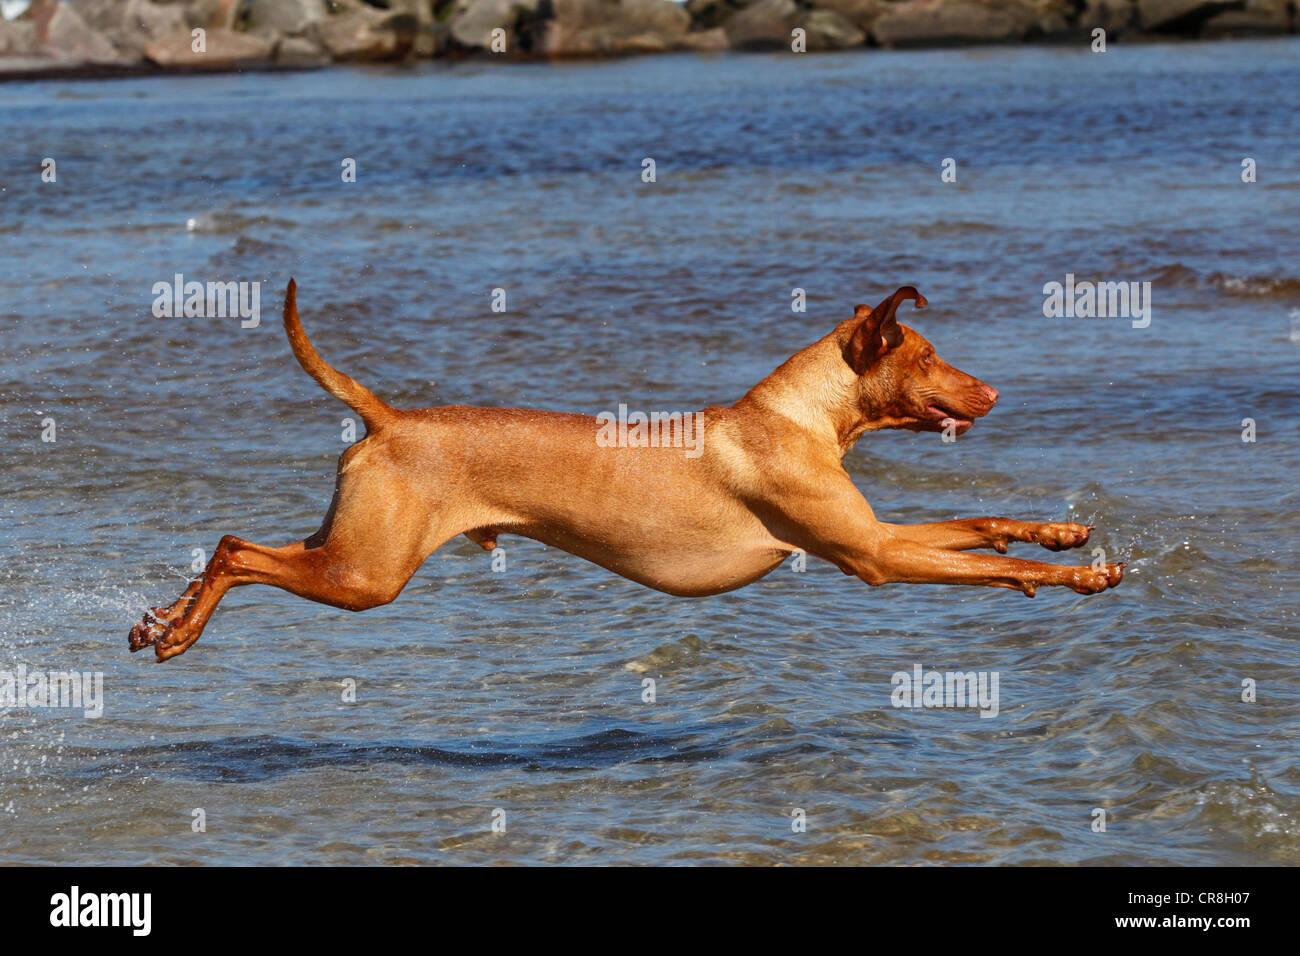 Magyar Vizsla, Hungarian Vizsla, or Hungarian Pointer, male dog (Canis lupus familiaris) running into the water - Stock Image